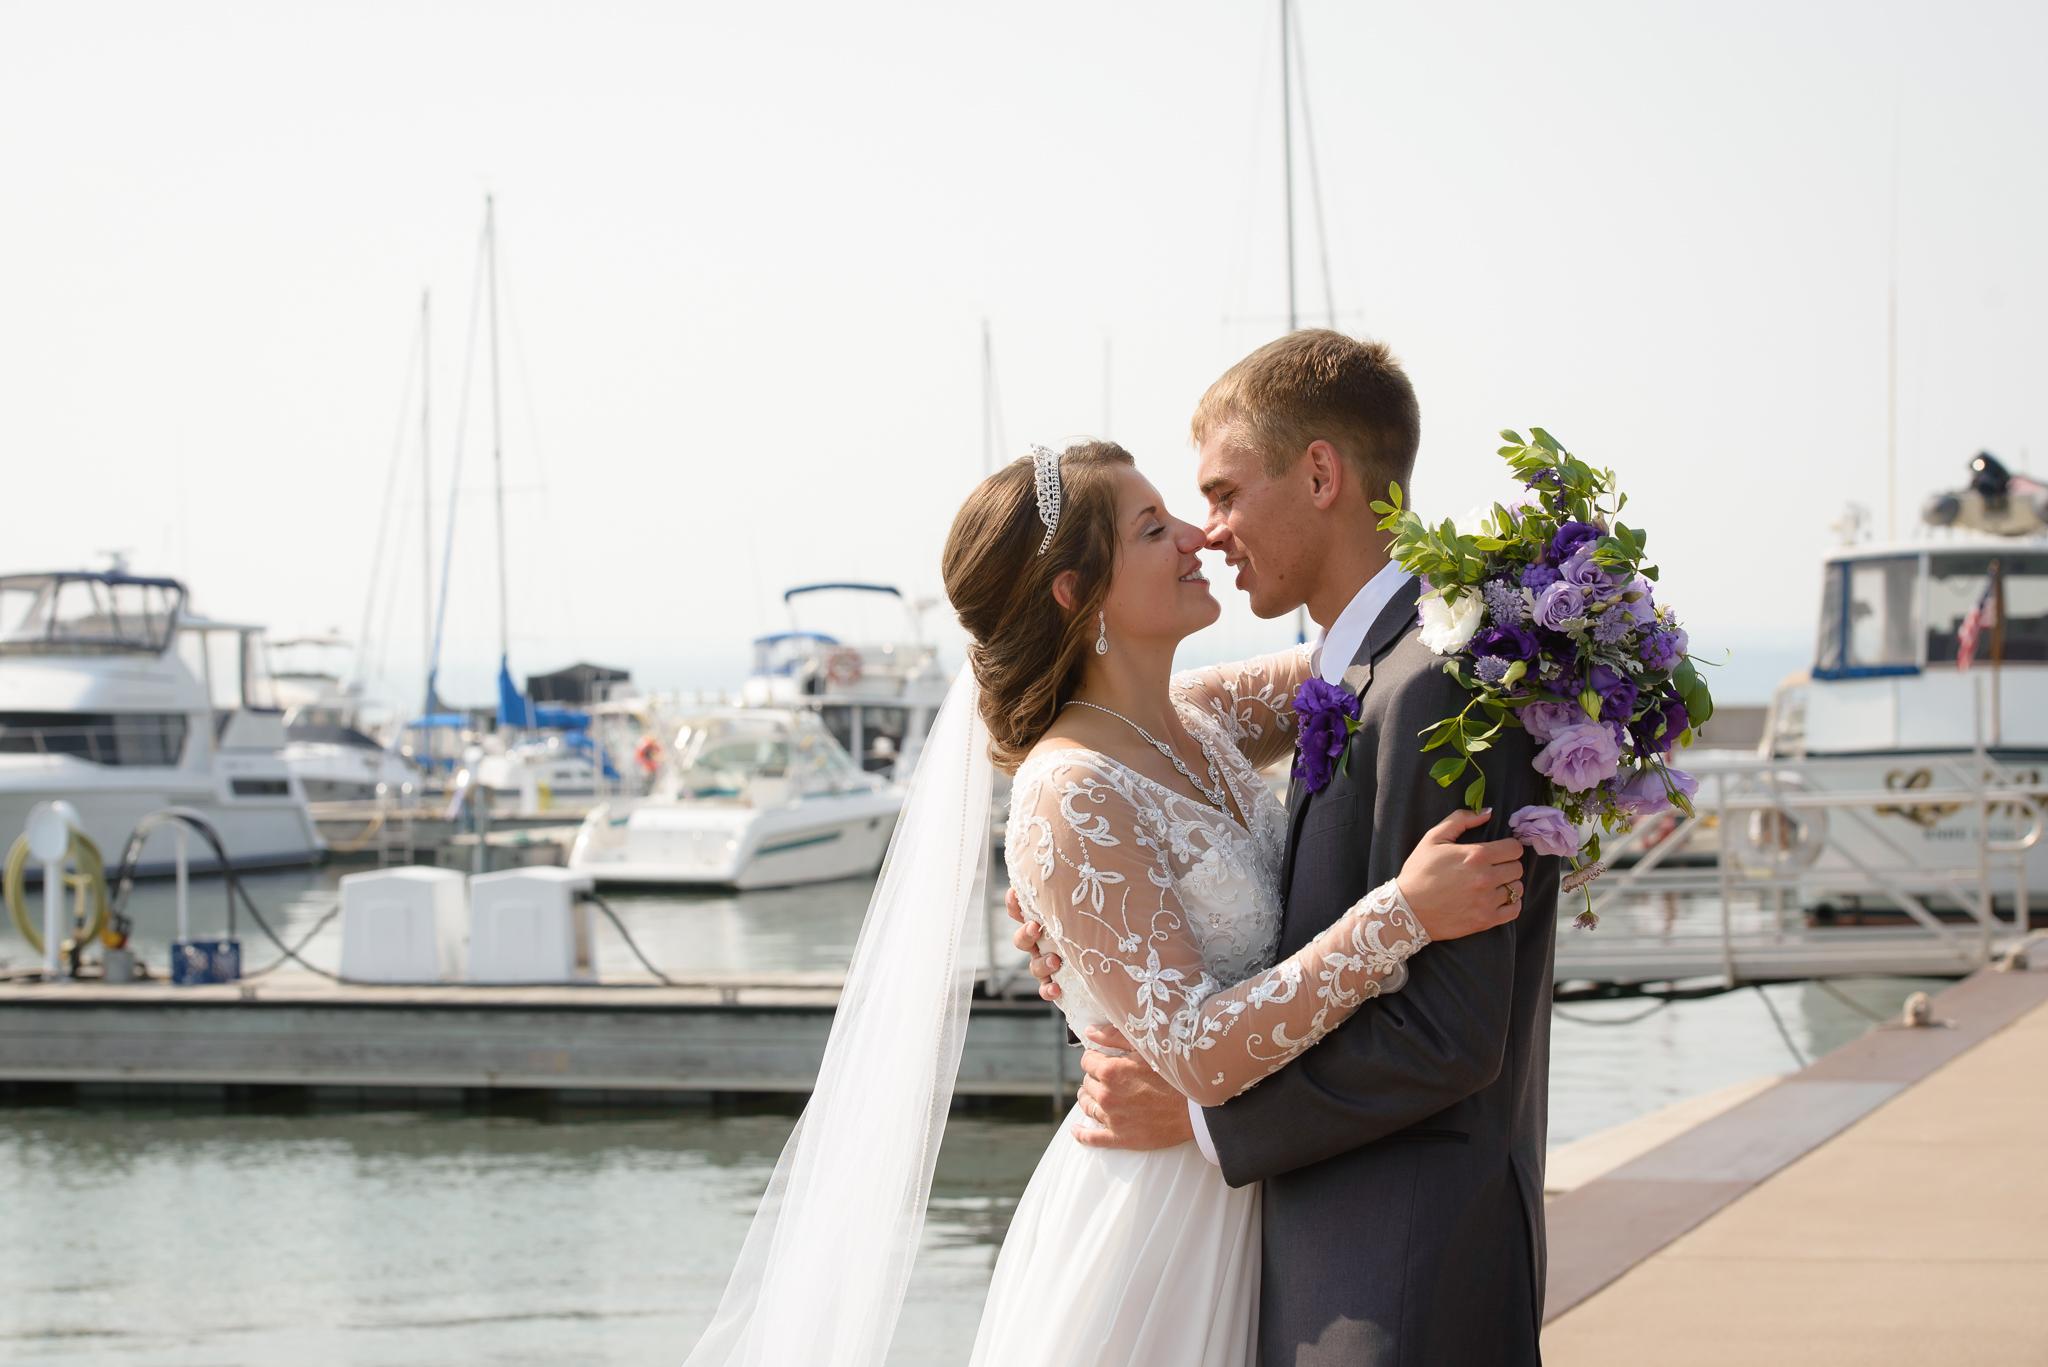 29-ashland washburn wedding photographyDSC_4561.jpg